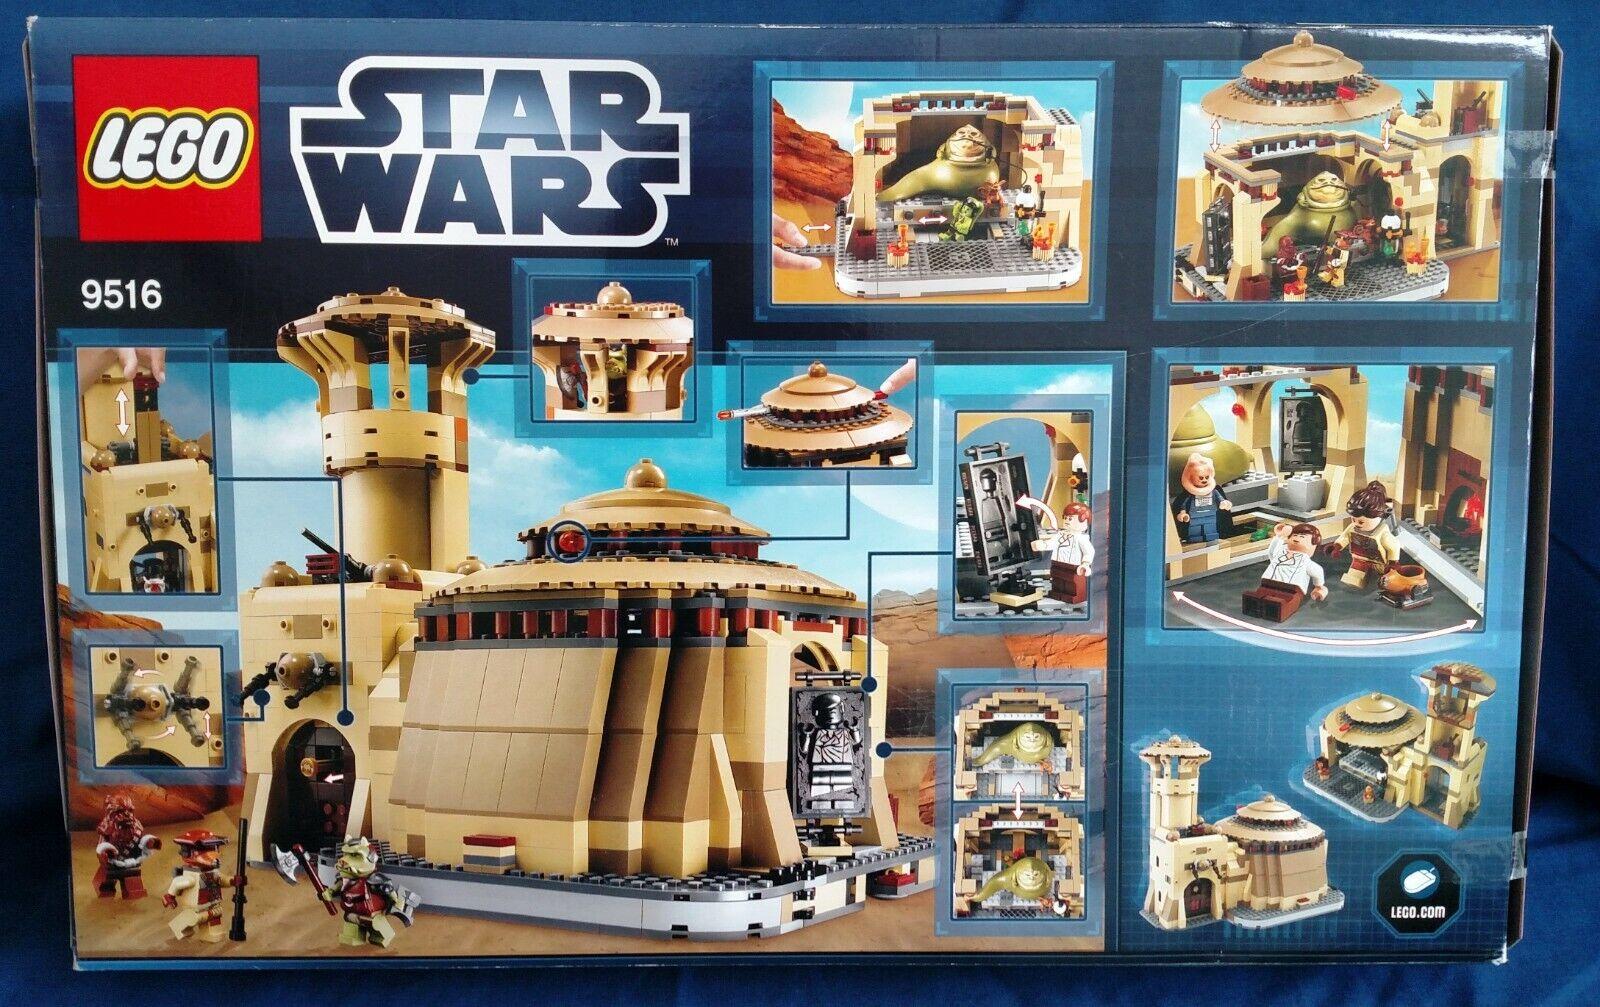 Lego Star Wars Jabba's Palace, Caja Sellada De Fábrica